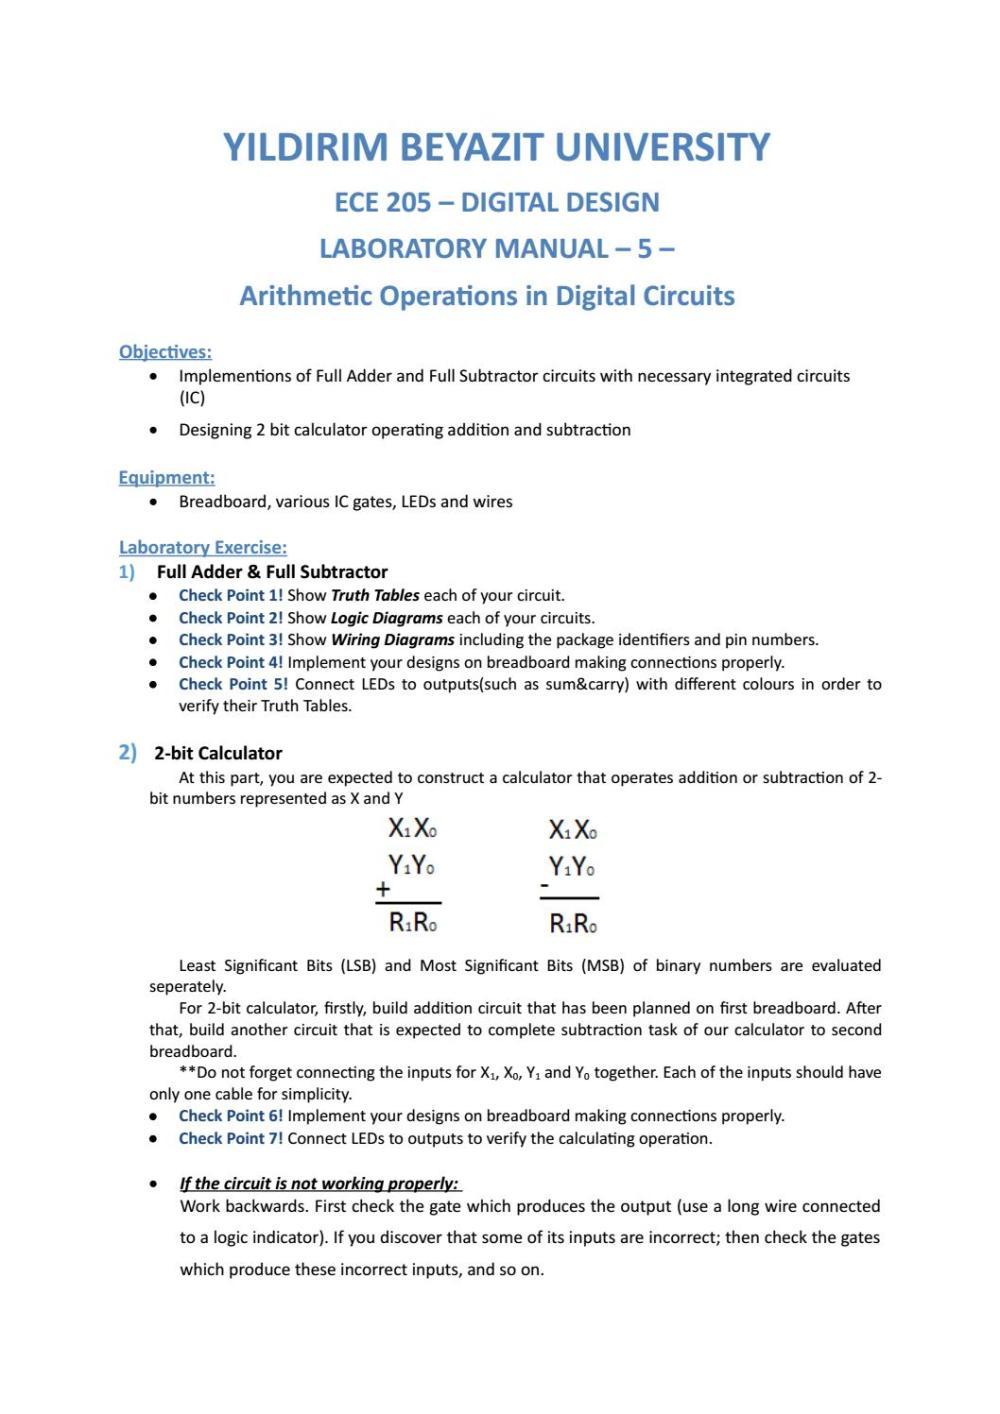 medium resolution of ee205 lab manual 5